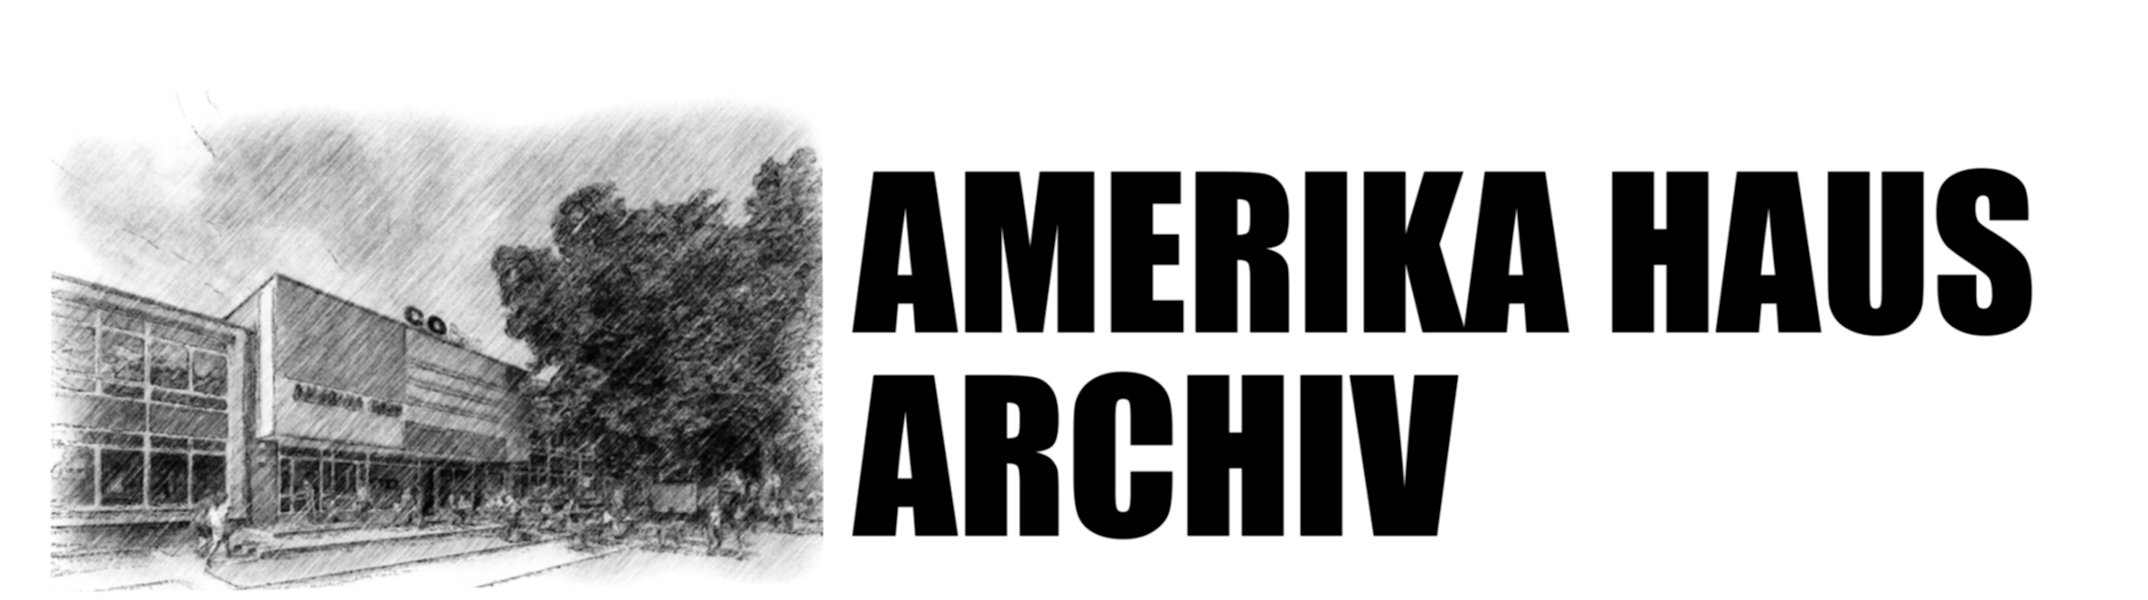 Amerika Haus Archiv